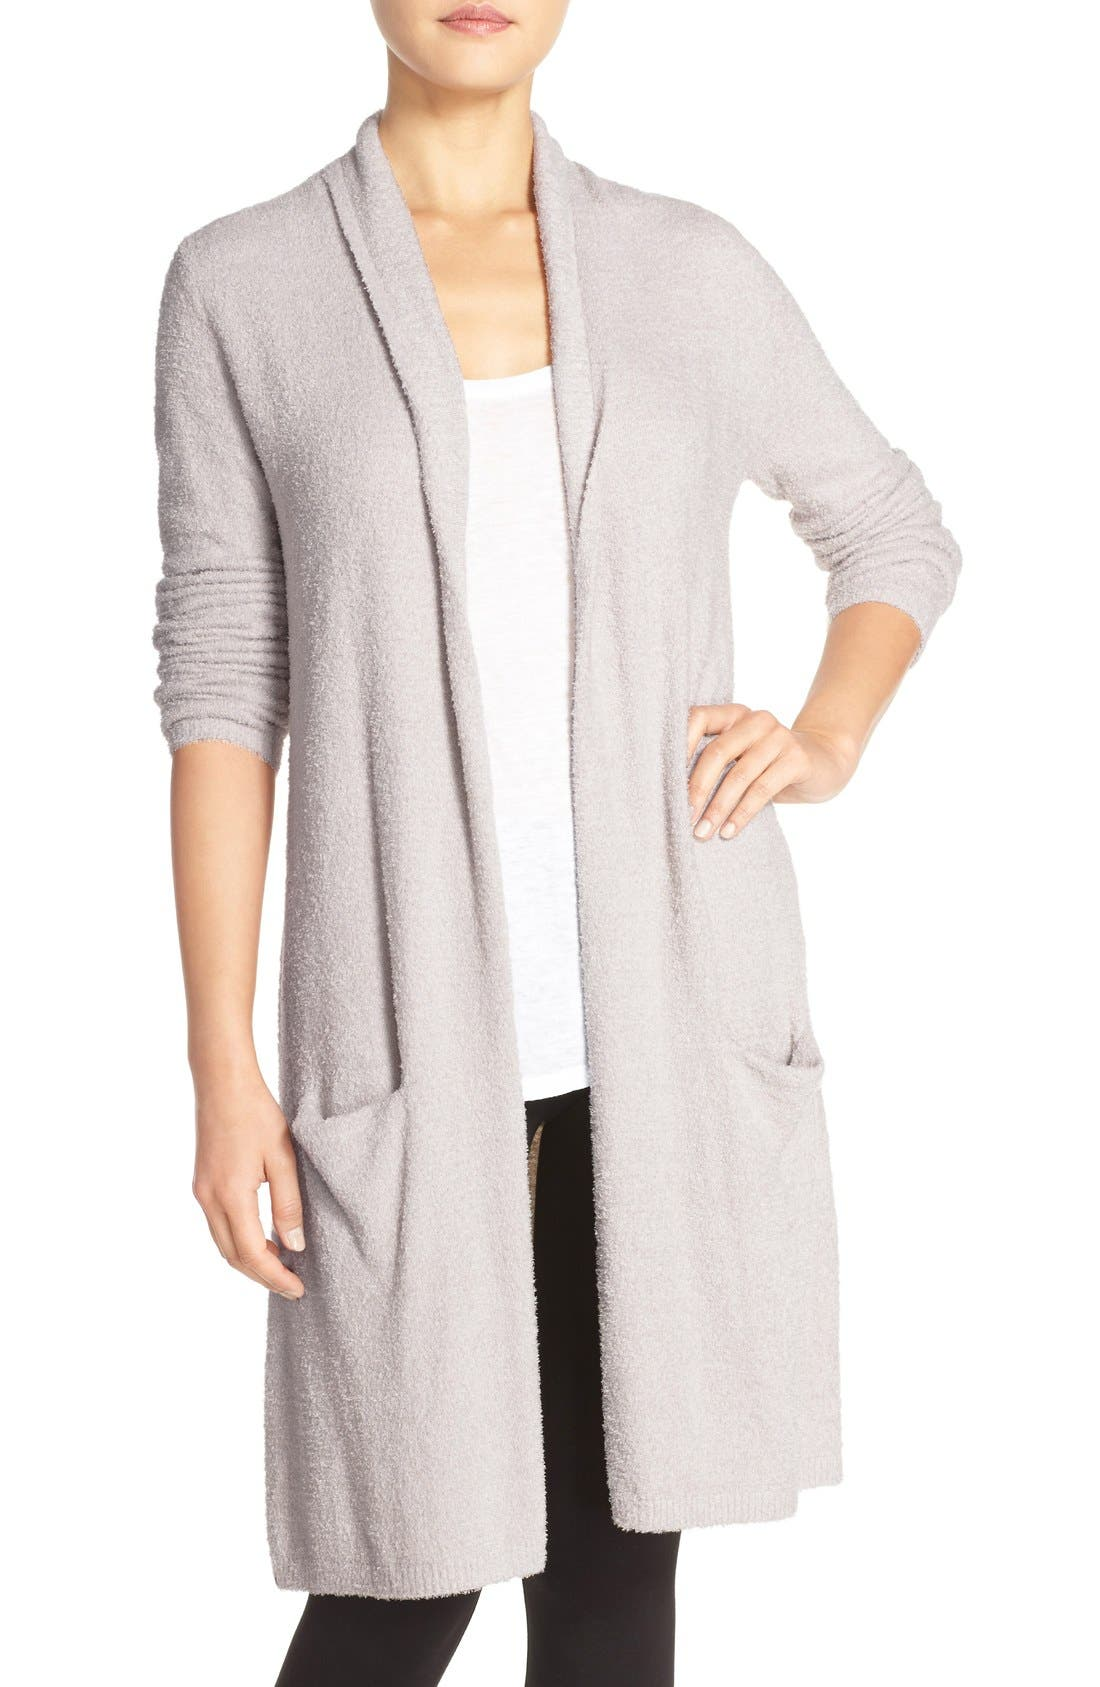 CozyChic Lite<sup>®</sup> Long Essential Cardigan,                         Main,                         color, 020